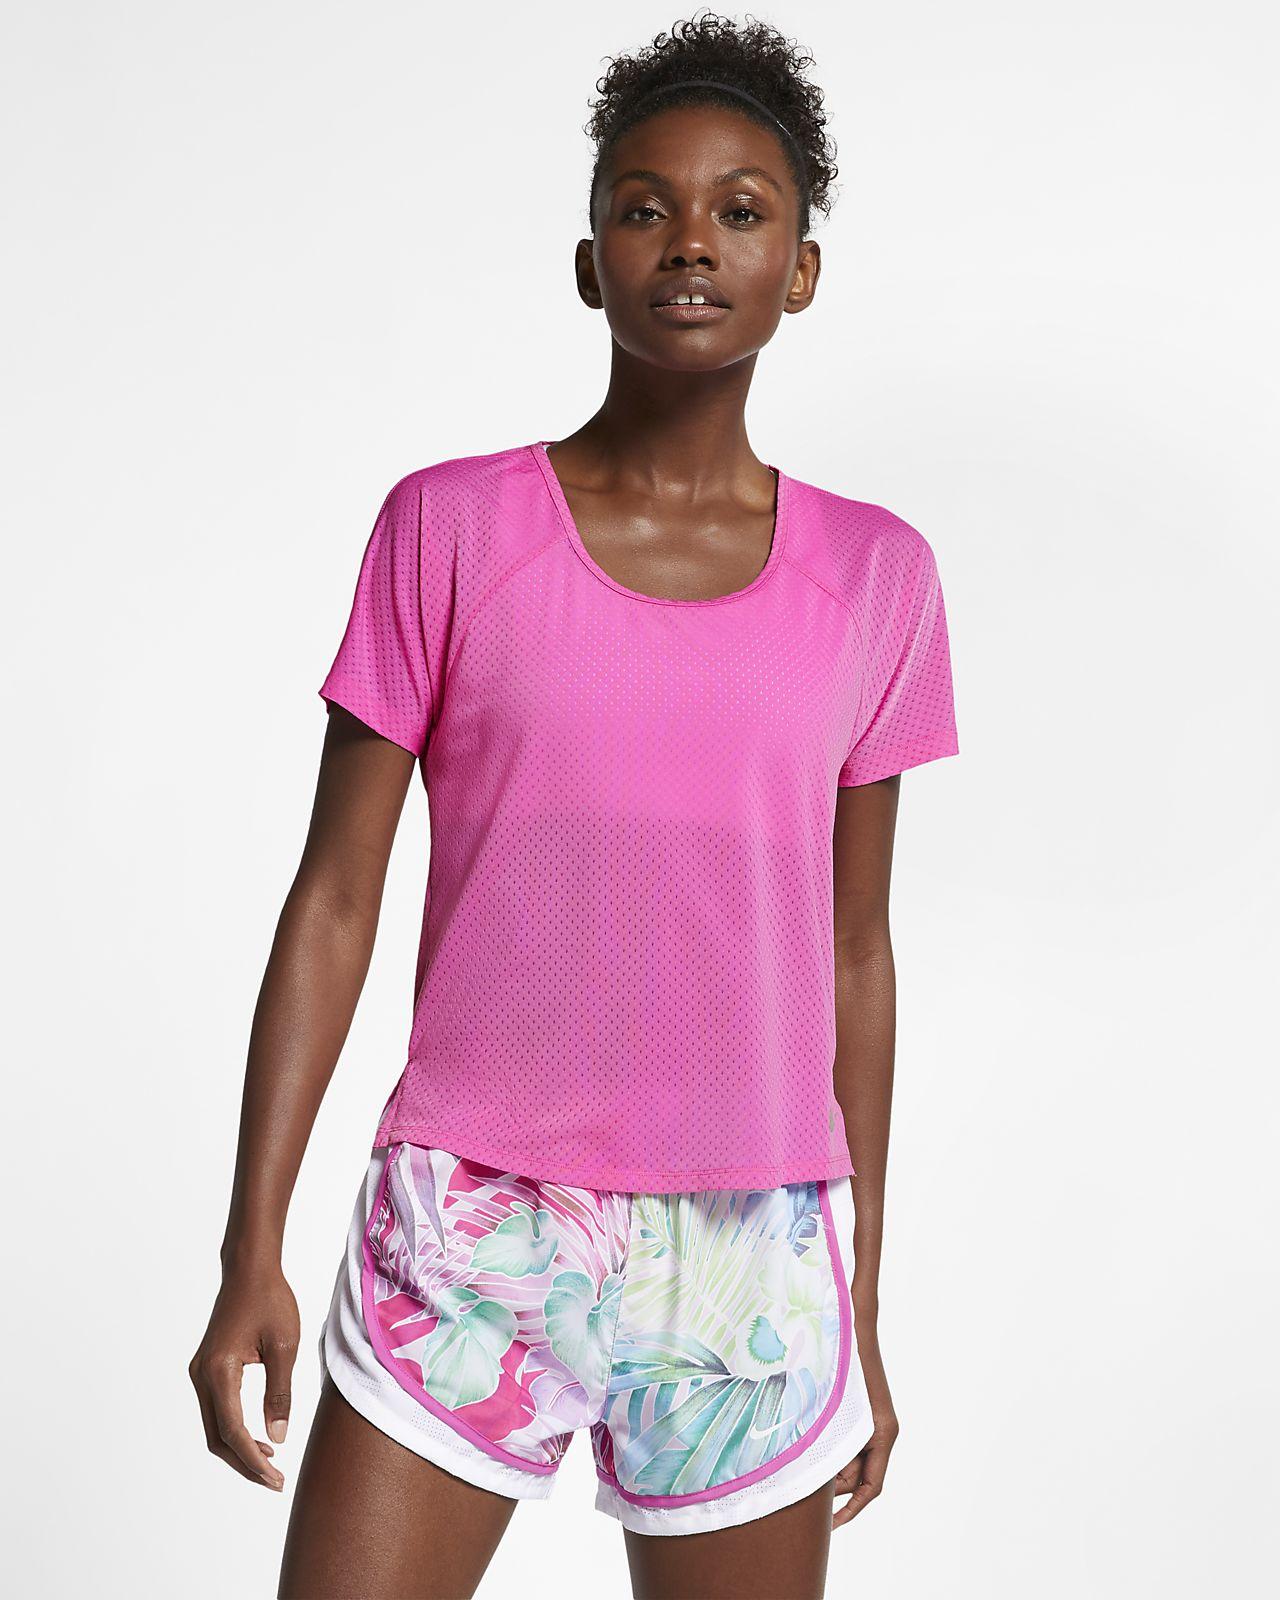 3d6e9f9a7b10 Γυναικεία μπλούζα για τρέξιμο Nike Breathe Miler. Nike.com GR